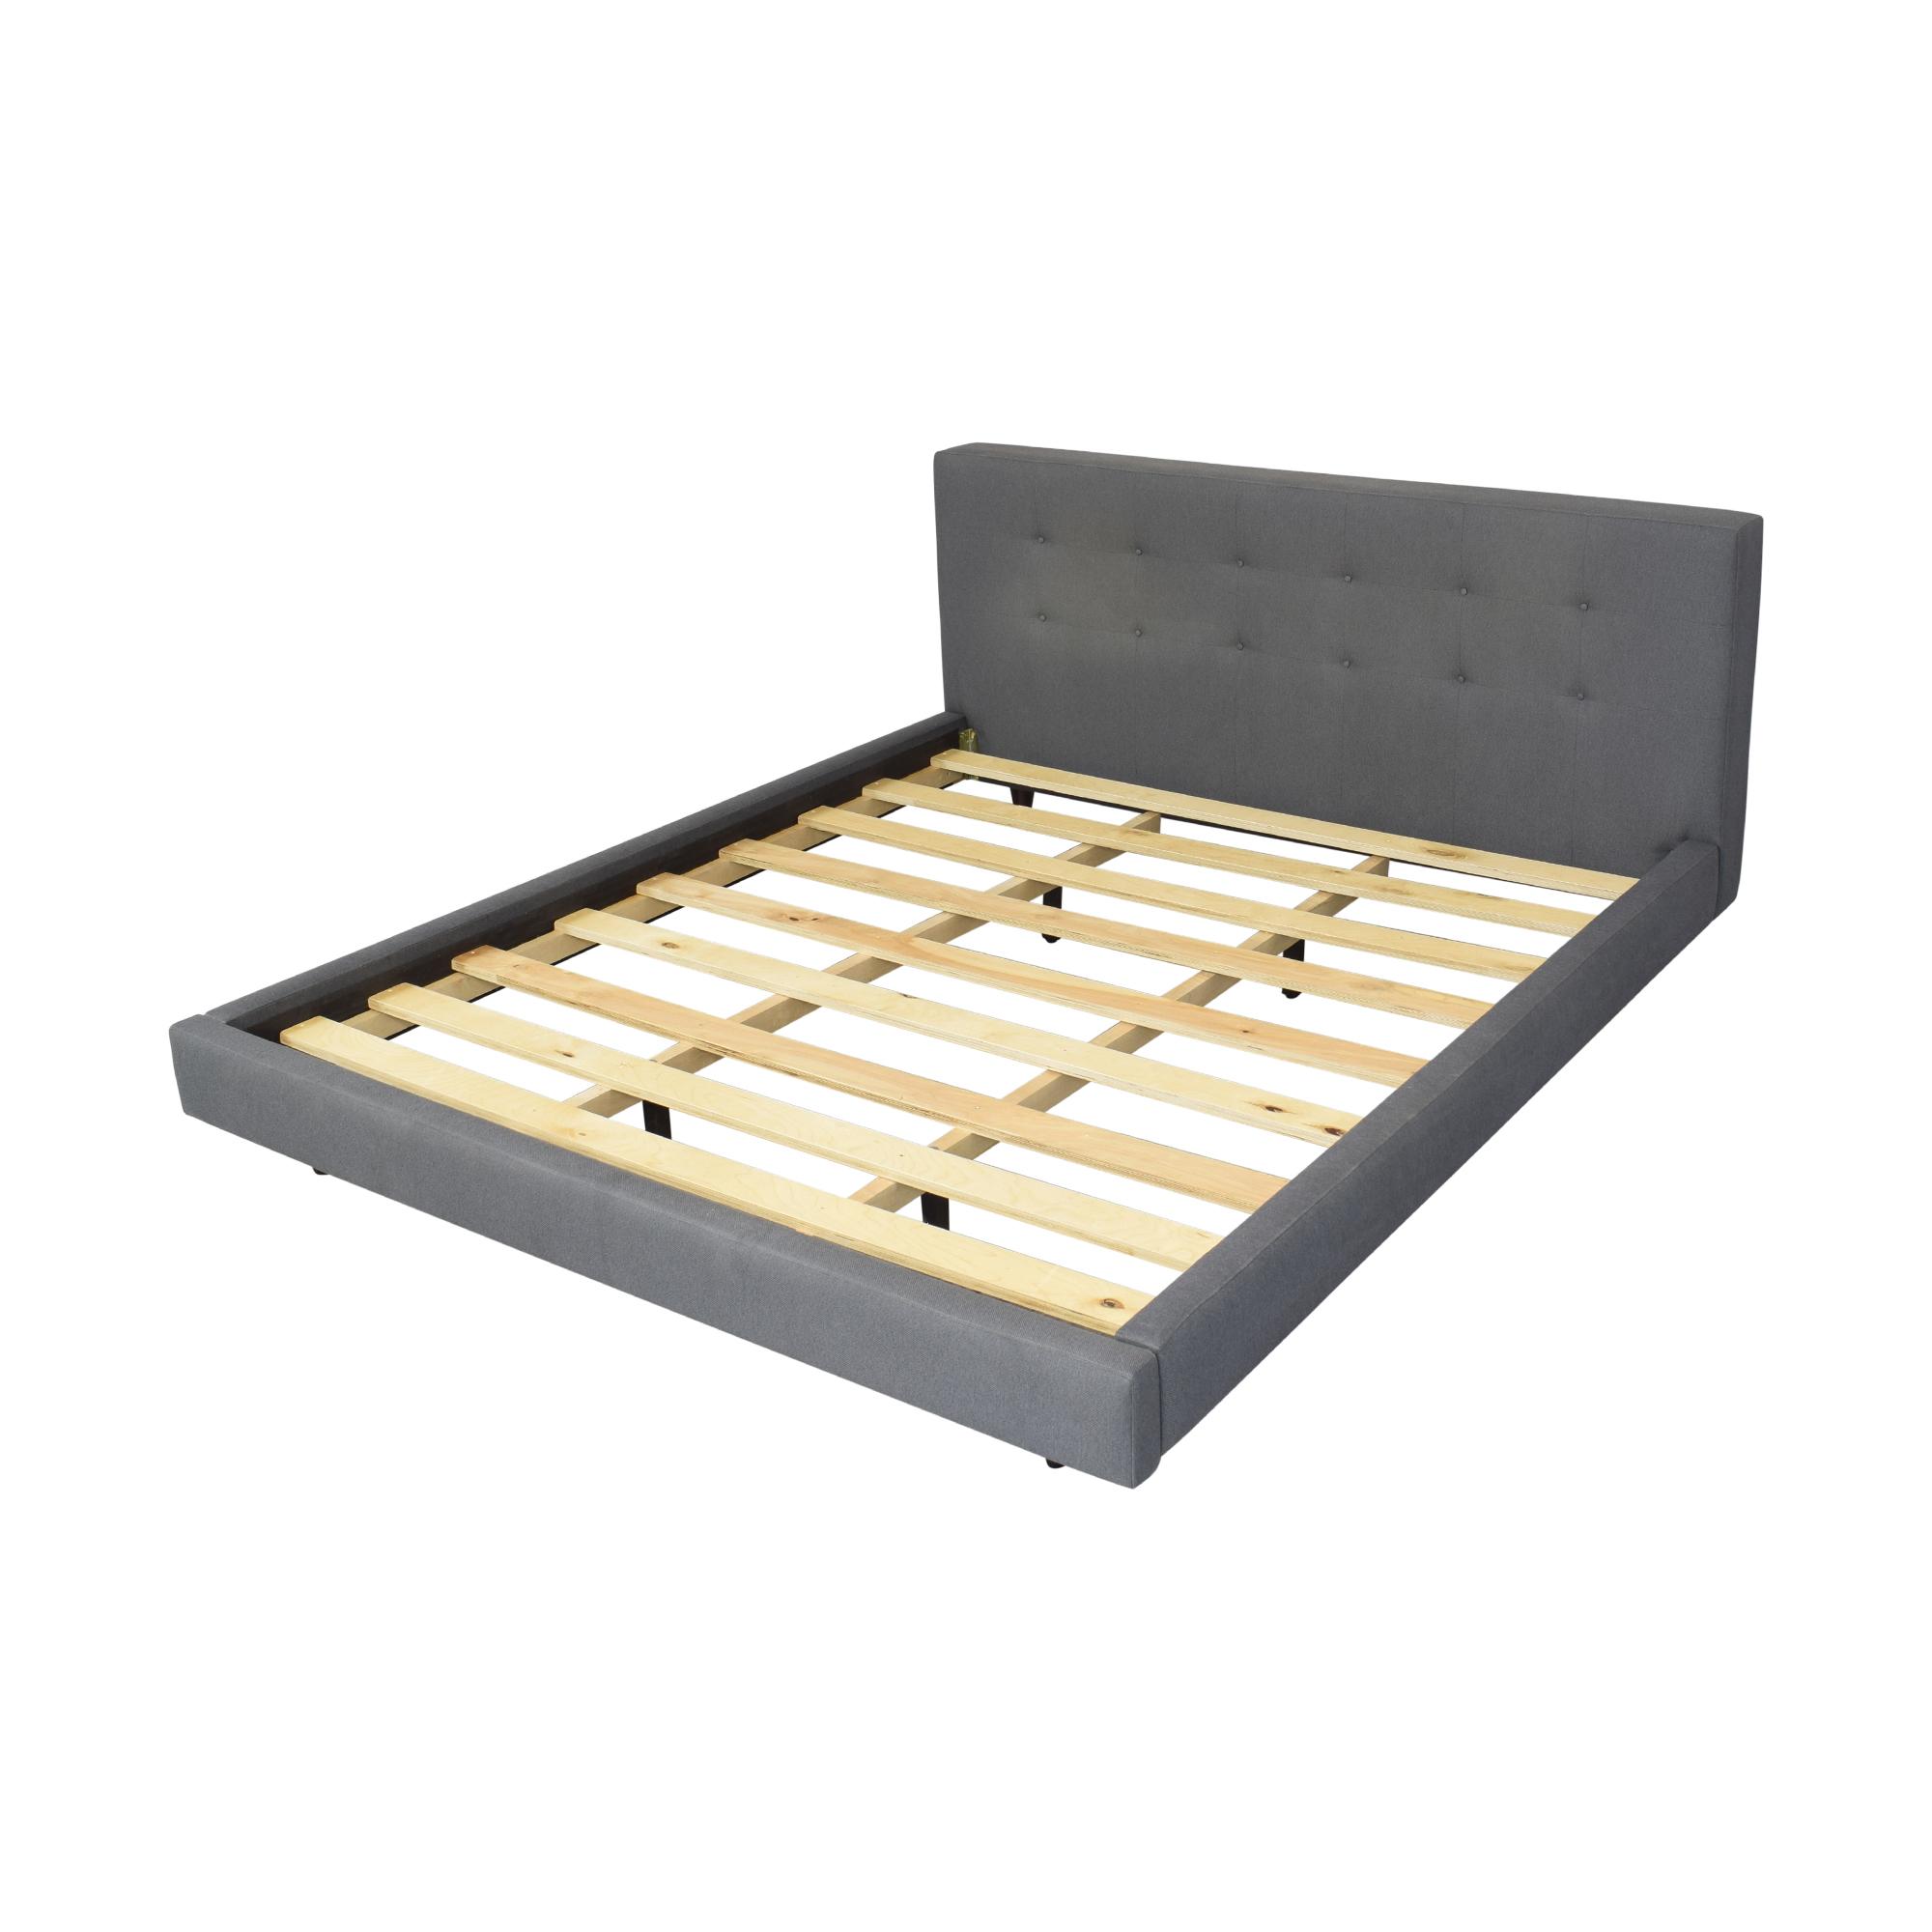 shop Crate & Barrel Crate & Barrel Tate California King Upholstered Bed online